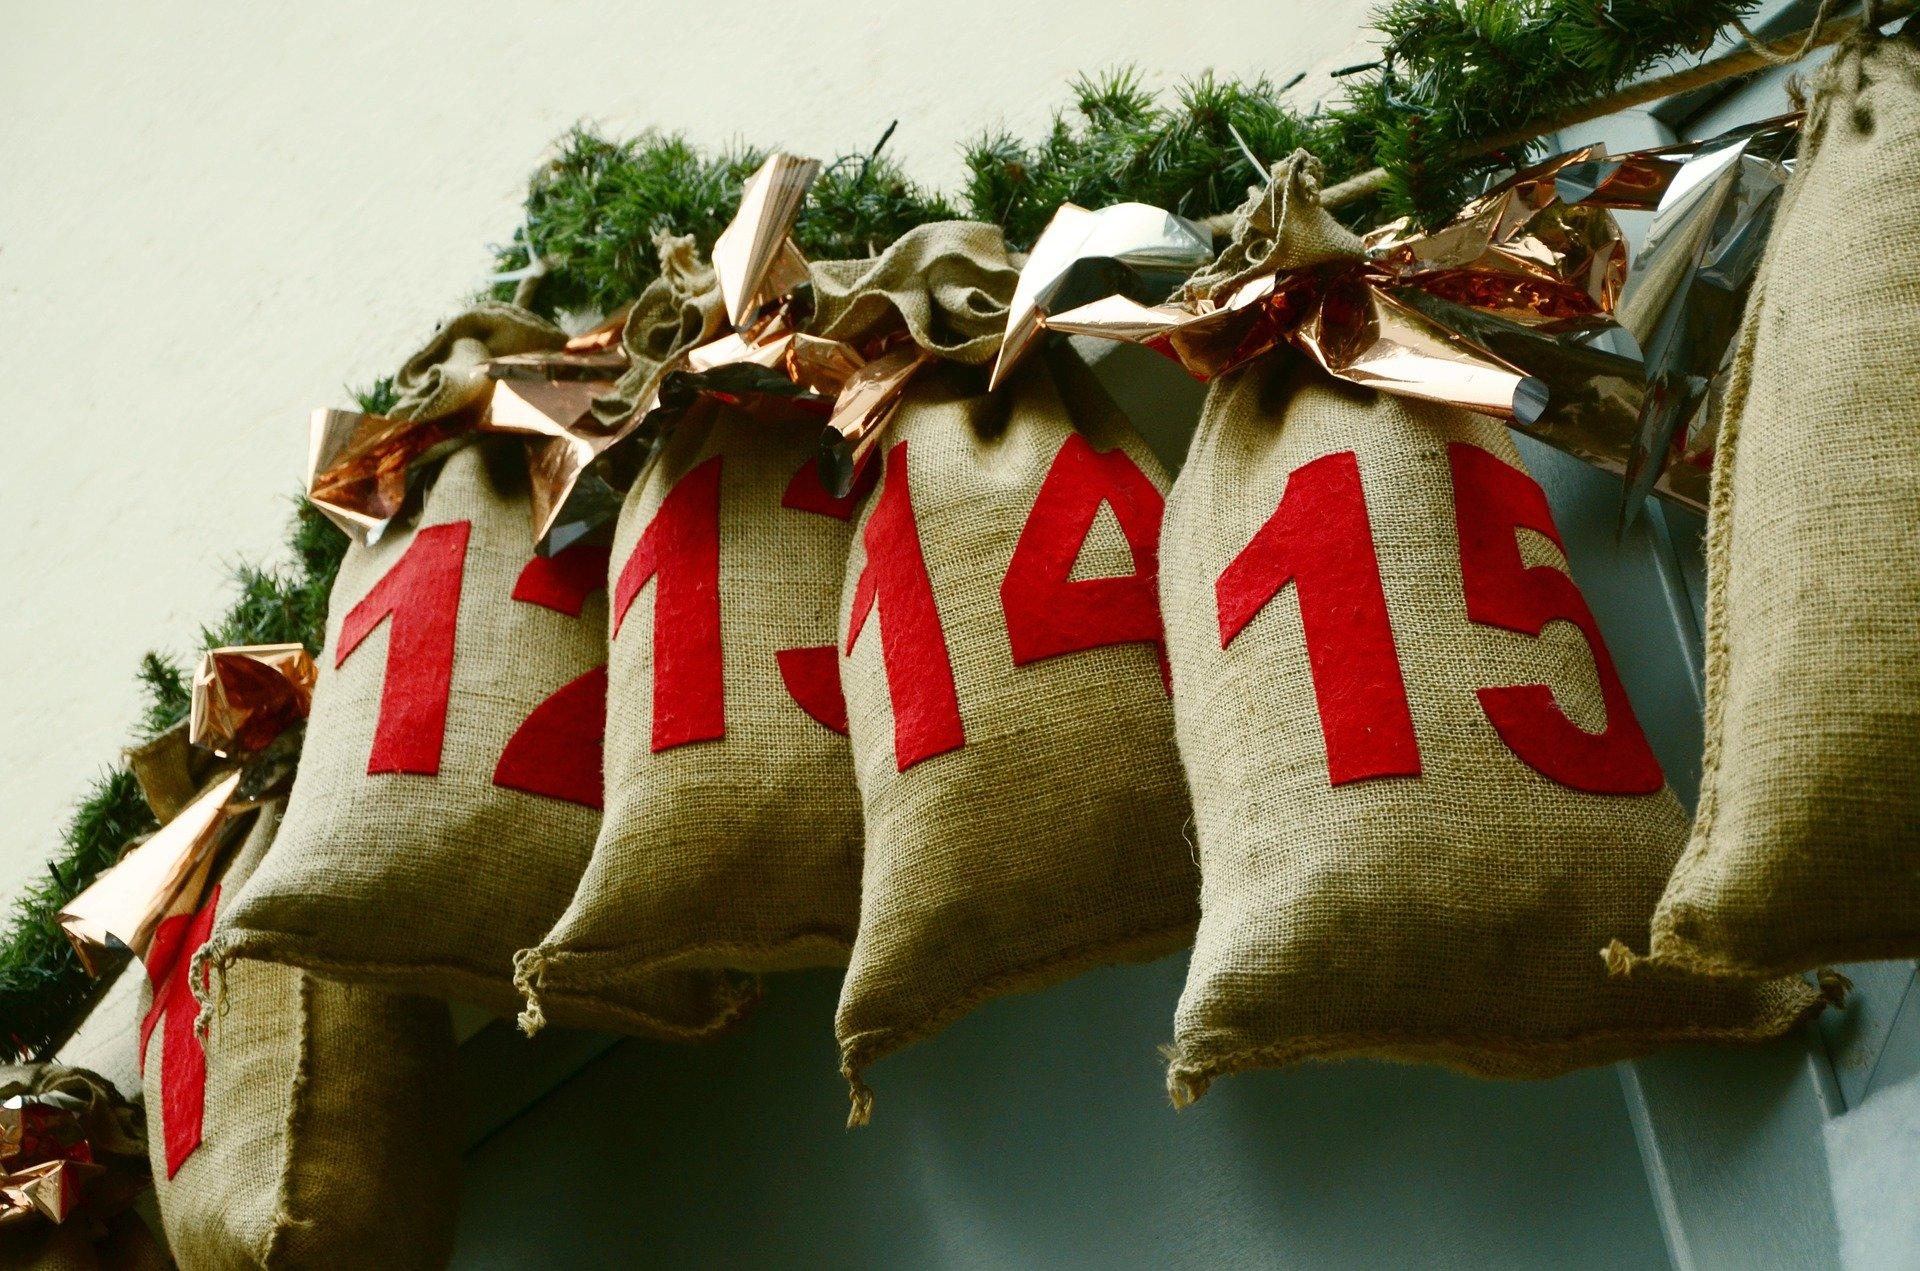 advent-calendar-1236036_1920.jpg